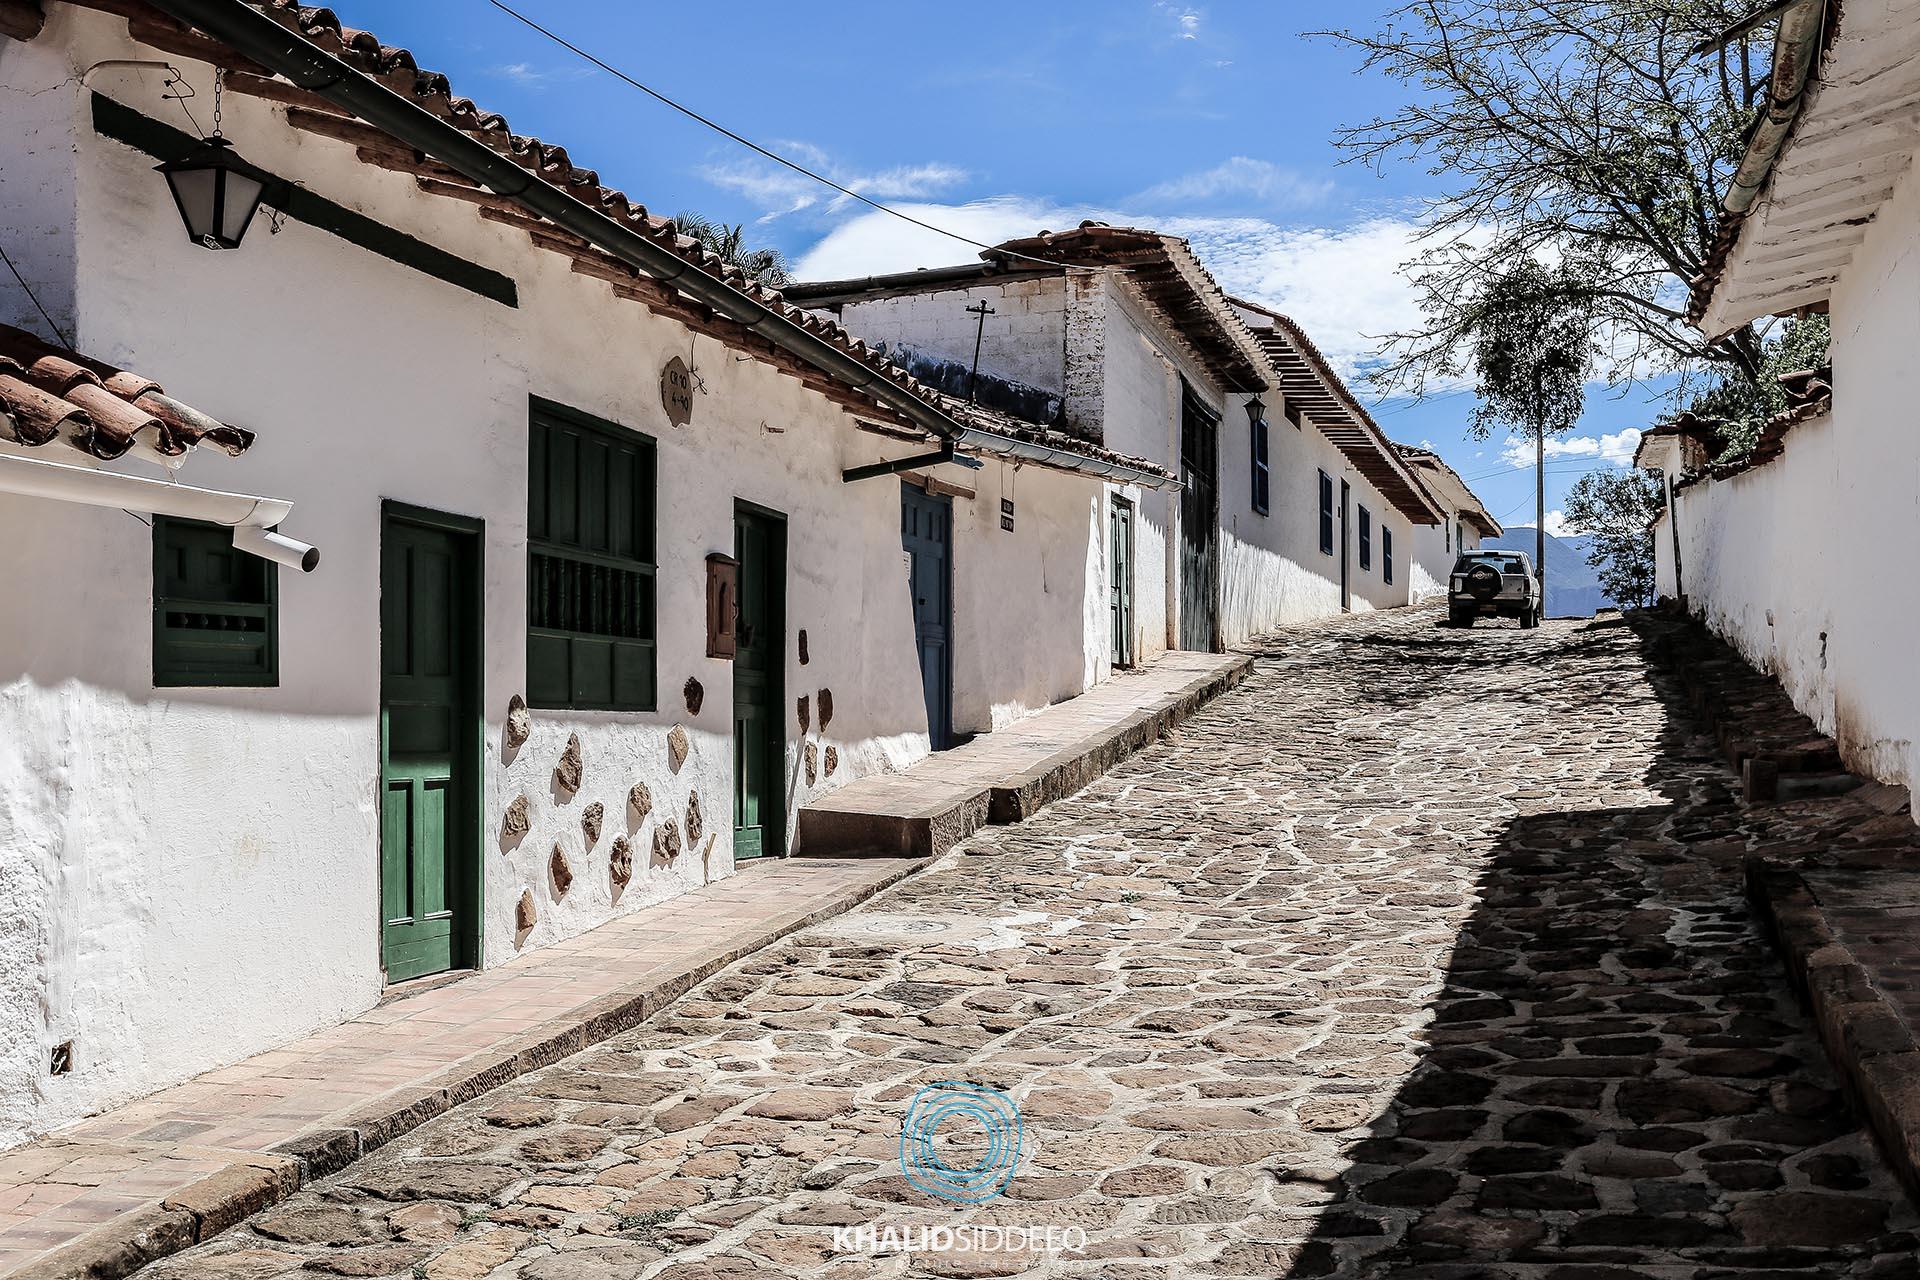 Colombia-15.jpg